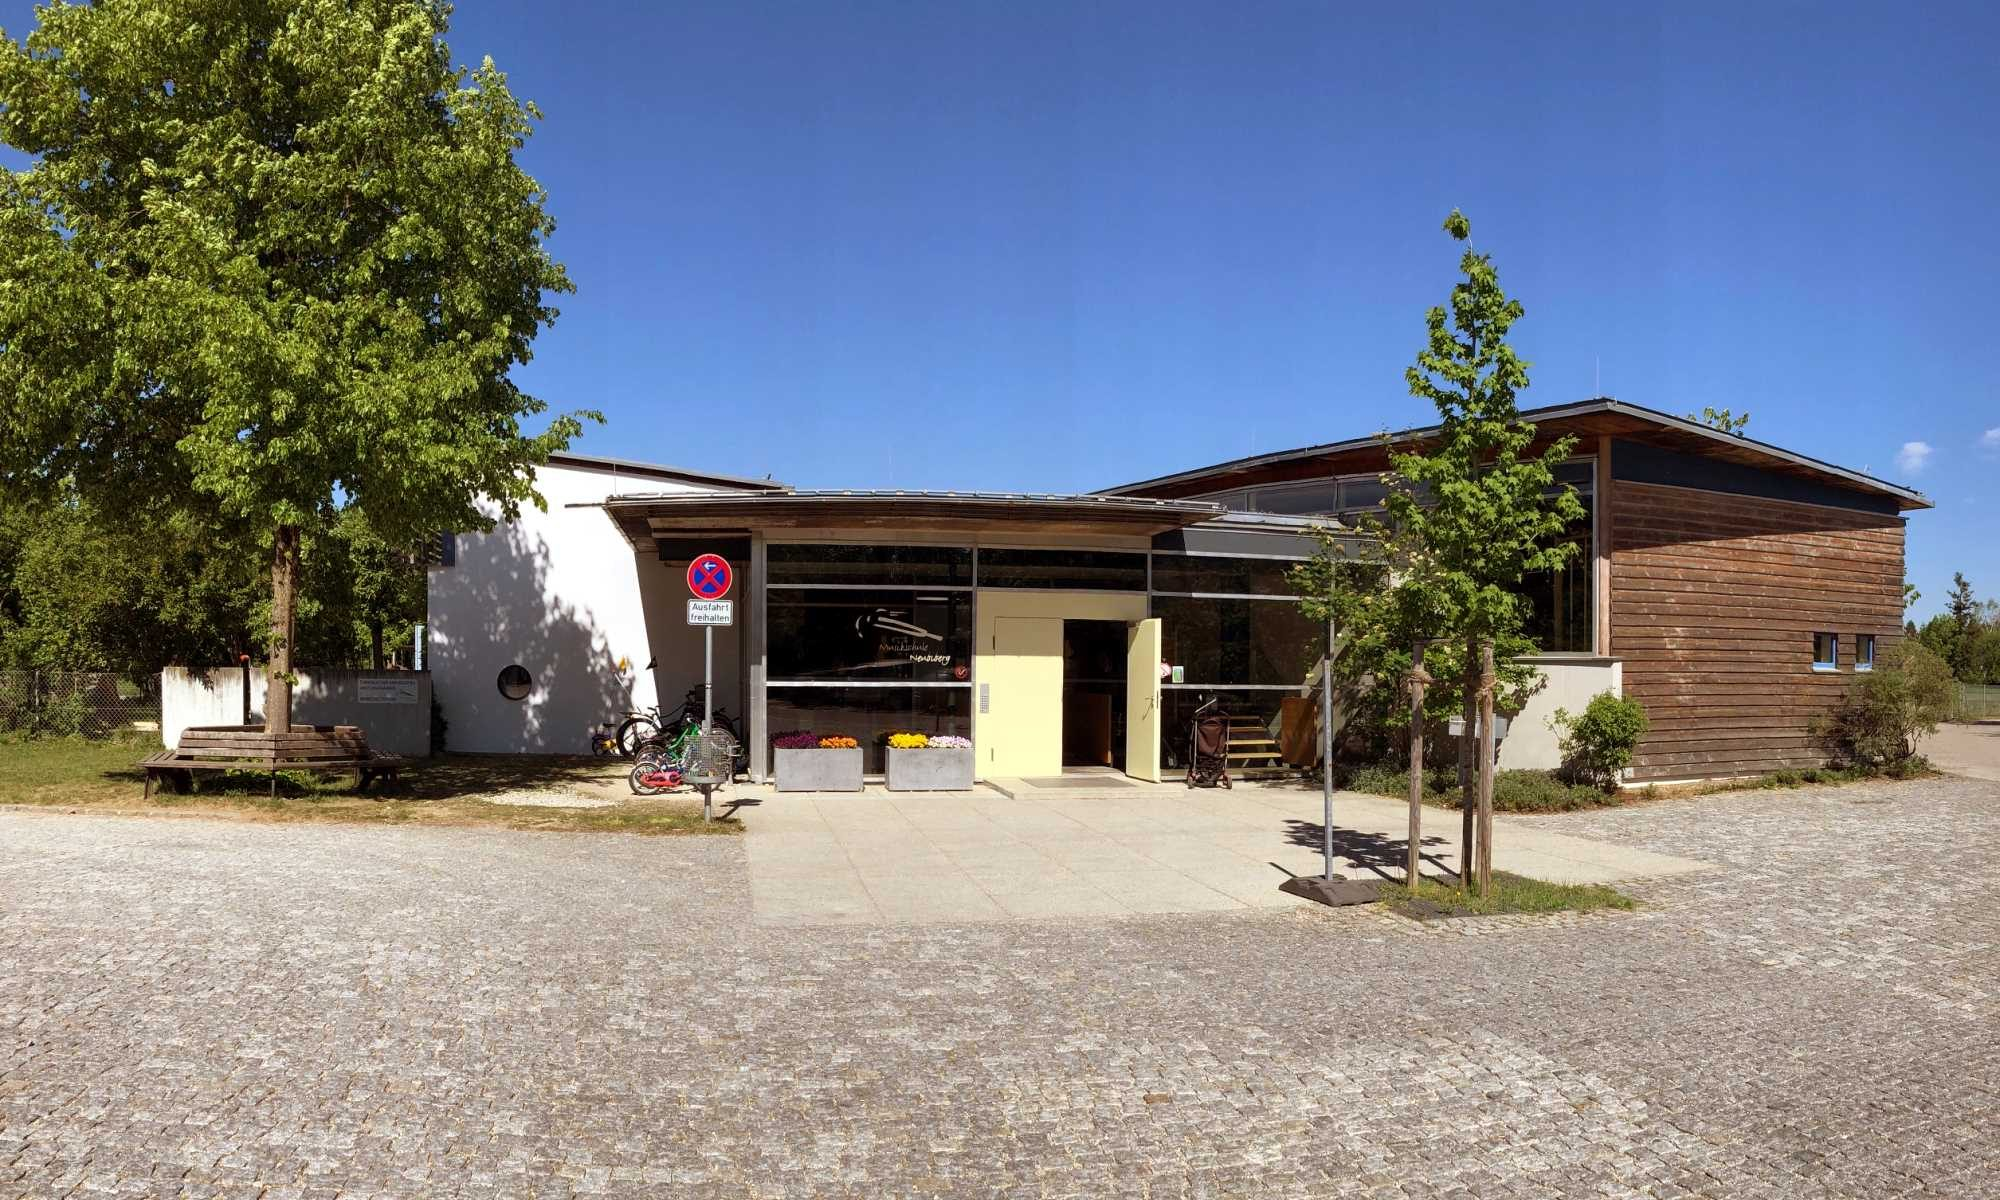 Evangelischer Kindergarten Floriansanger